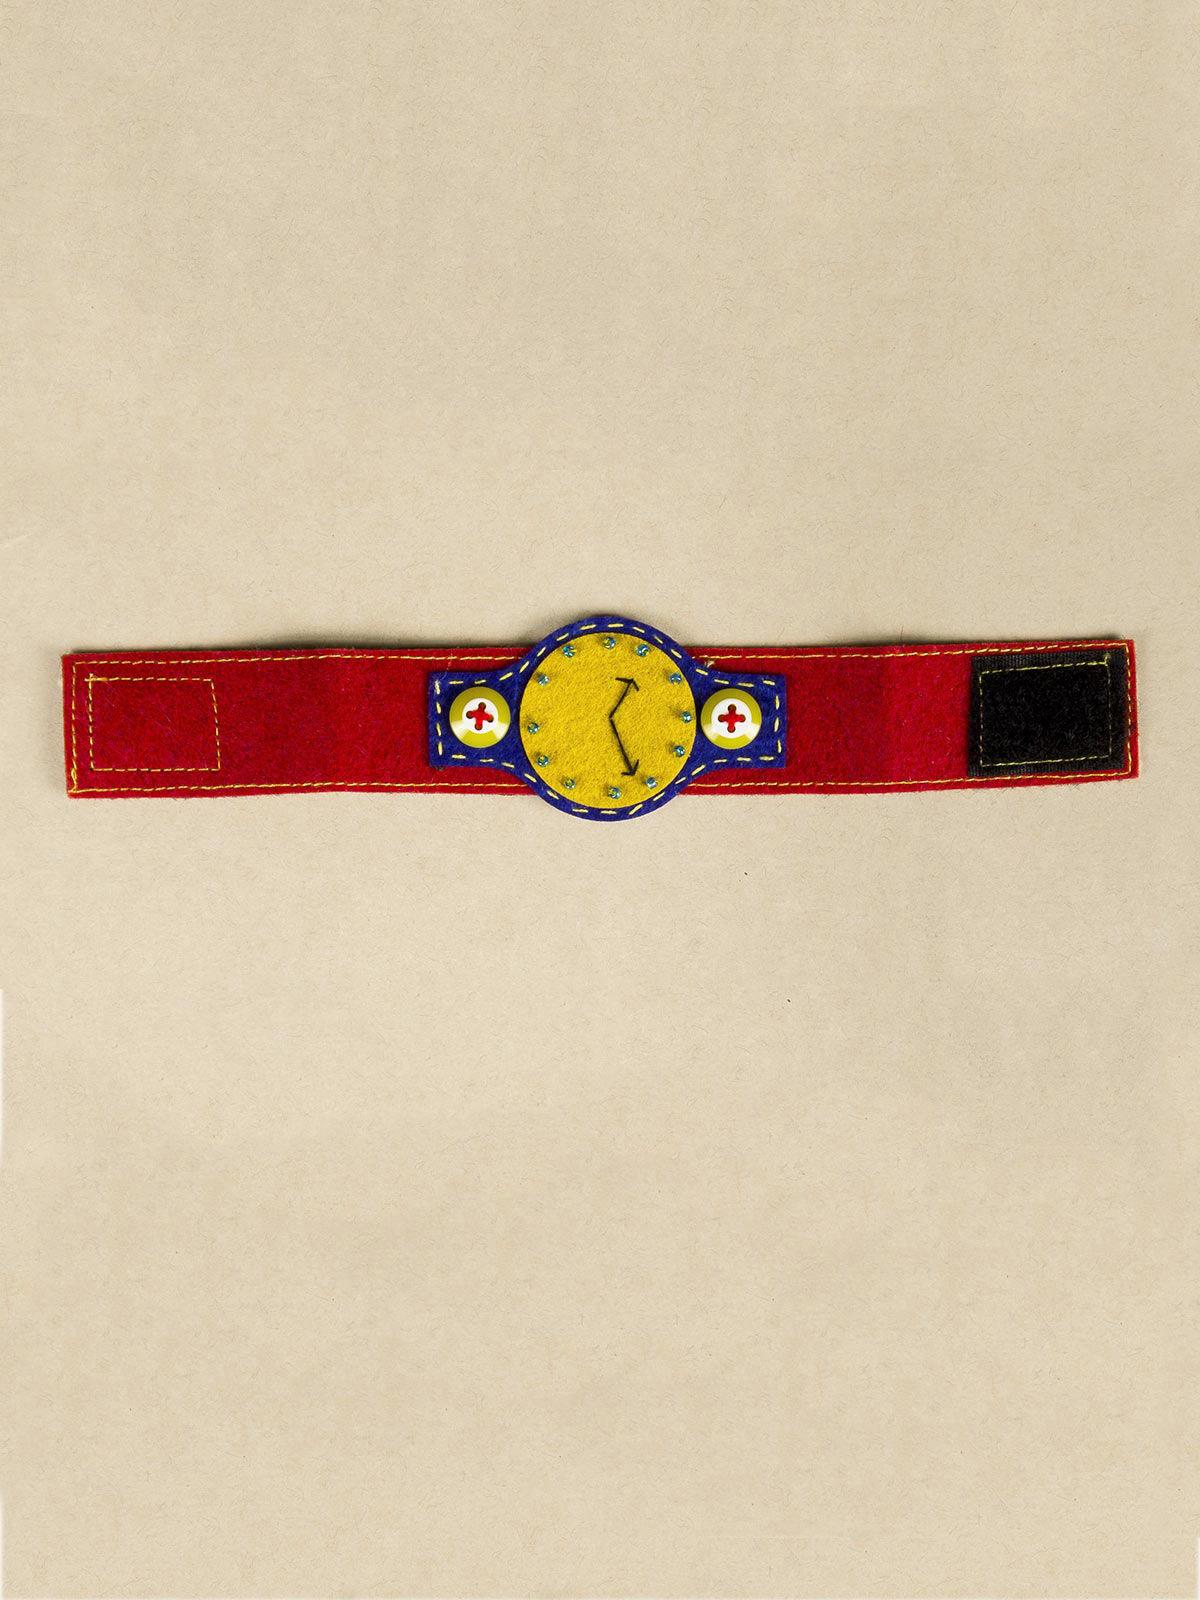 The Wristwatch Rakhi